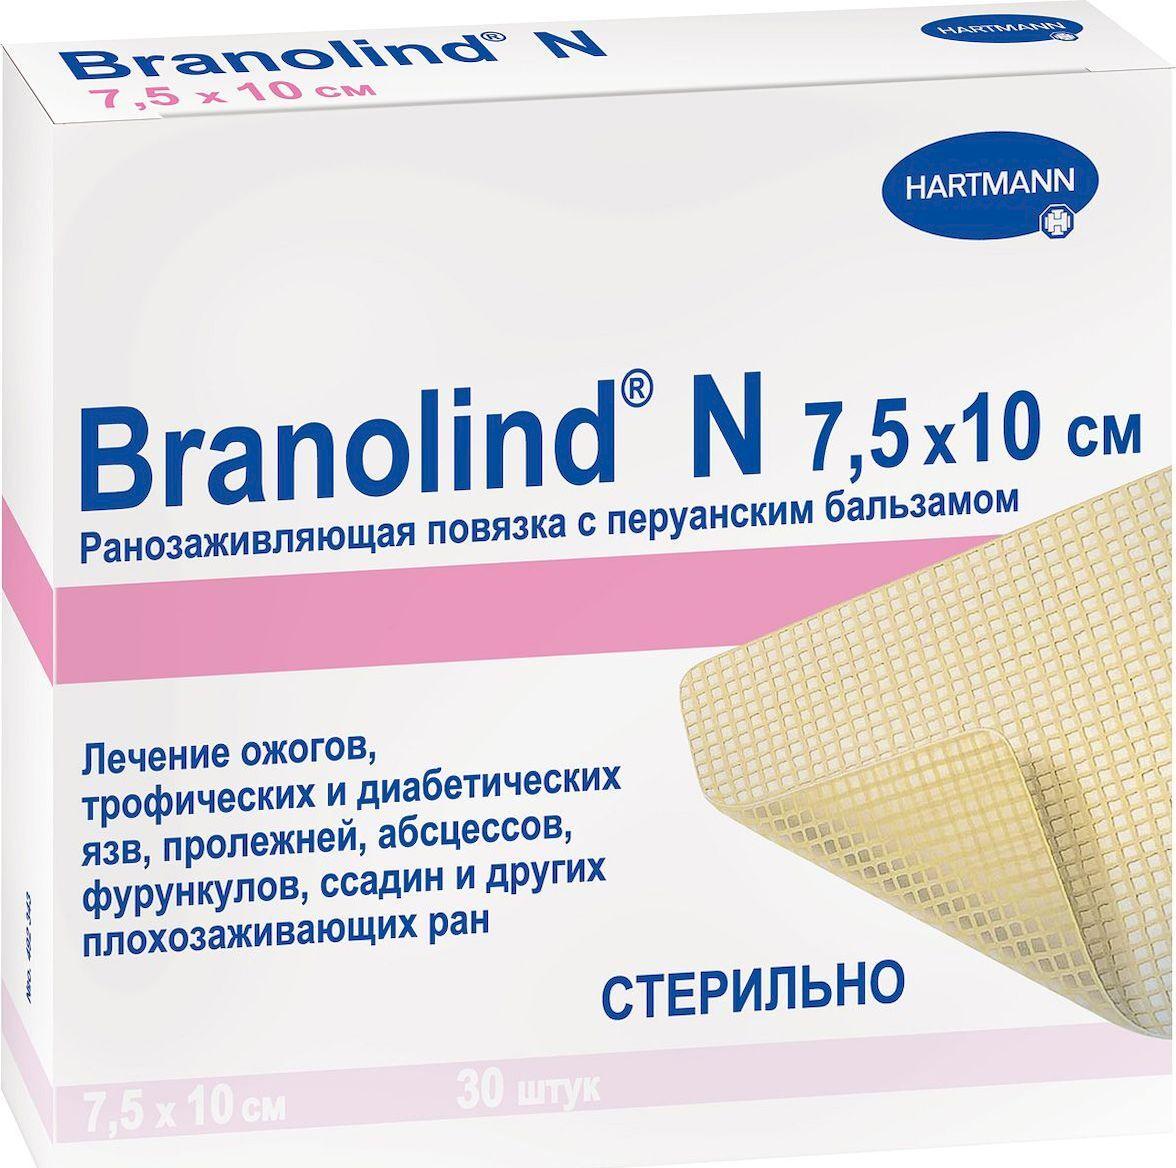 Повязка Hartmann BRANOLIND N с перуанским бальзамом 7,5 х 10 см 30 шт